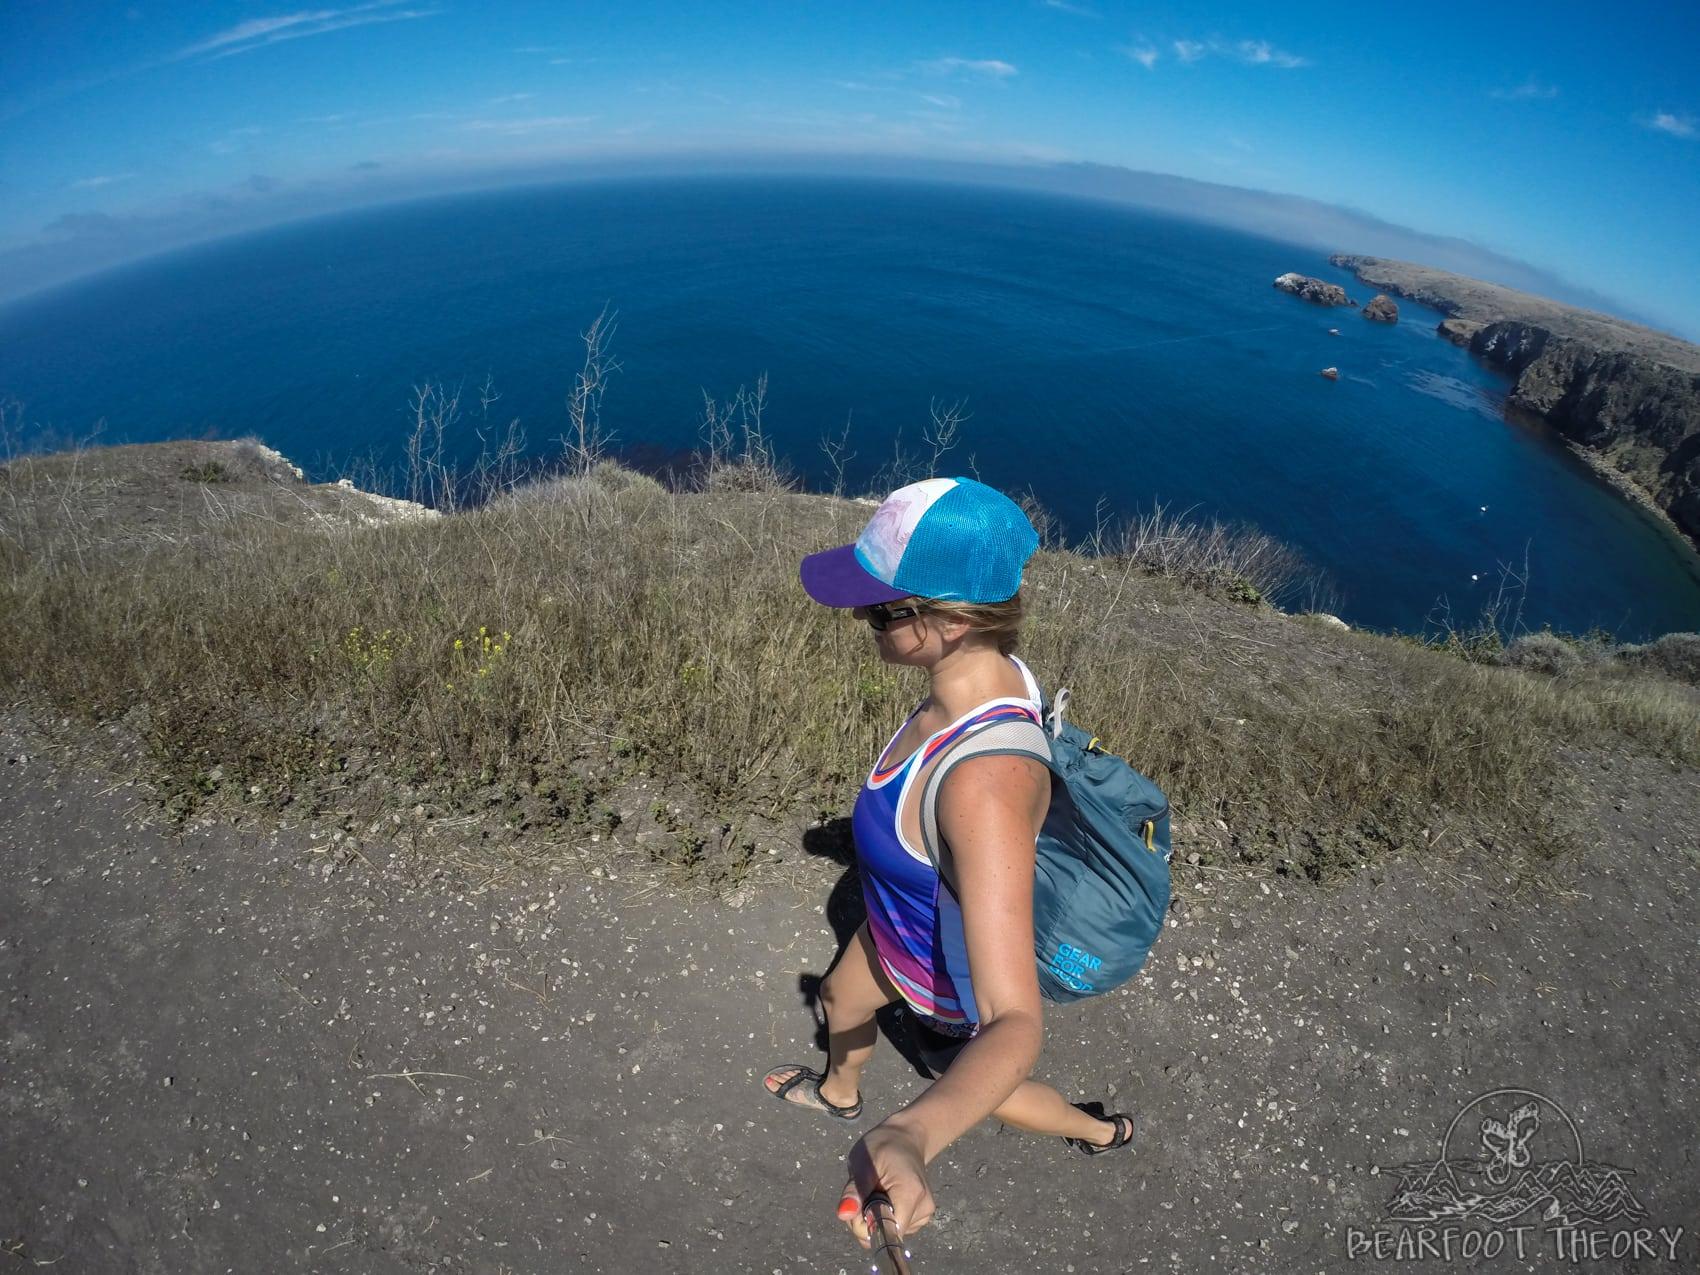 Hiking on Santa Cruz Island in Channel Islands National Park